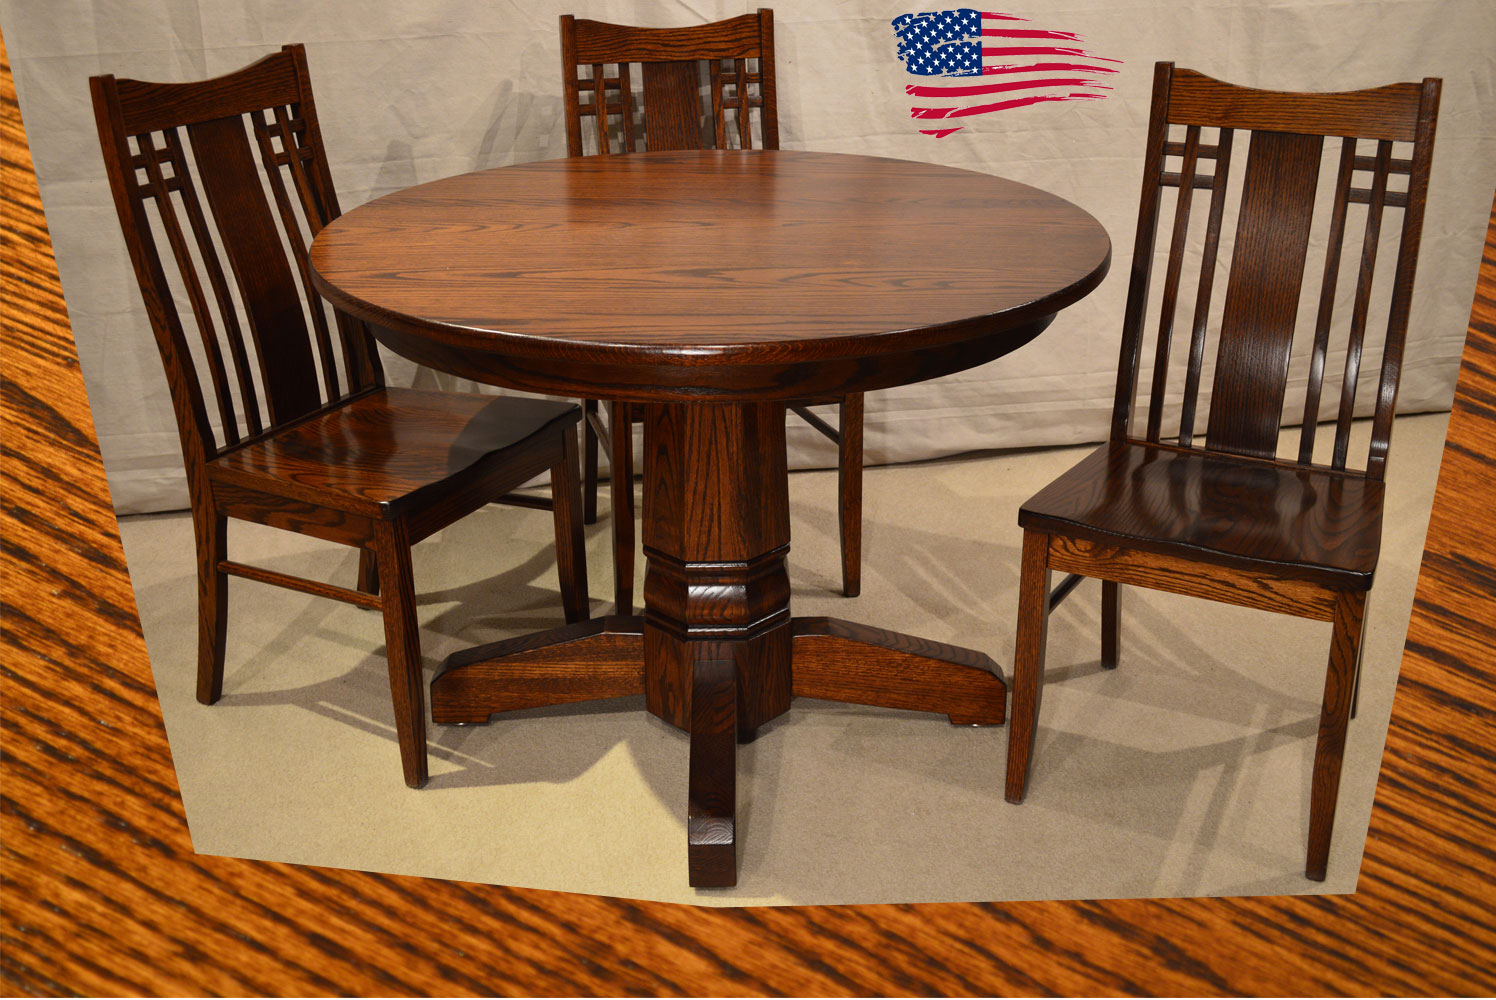 Fine Amish Dining Furniture Michigan Jasens Fine Furniture Home Interior And Landscaping Oversignezvosmurscom